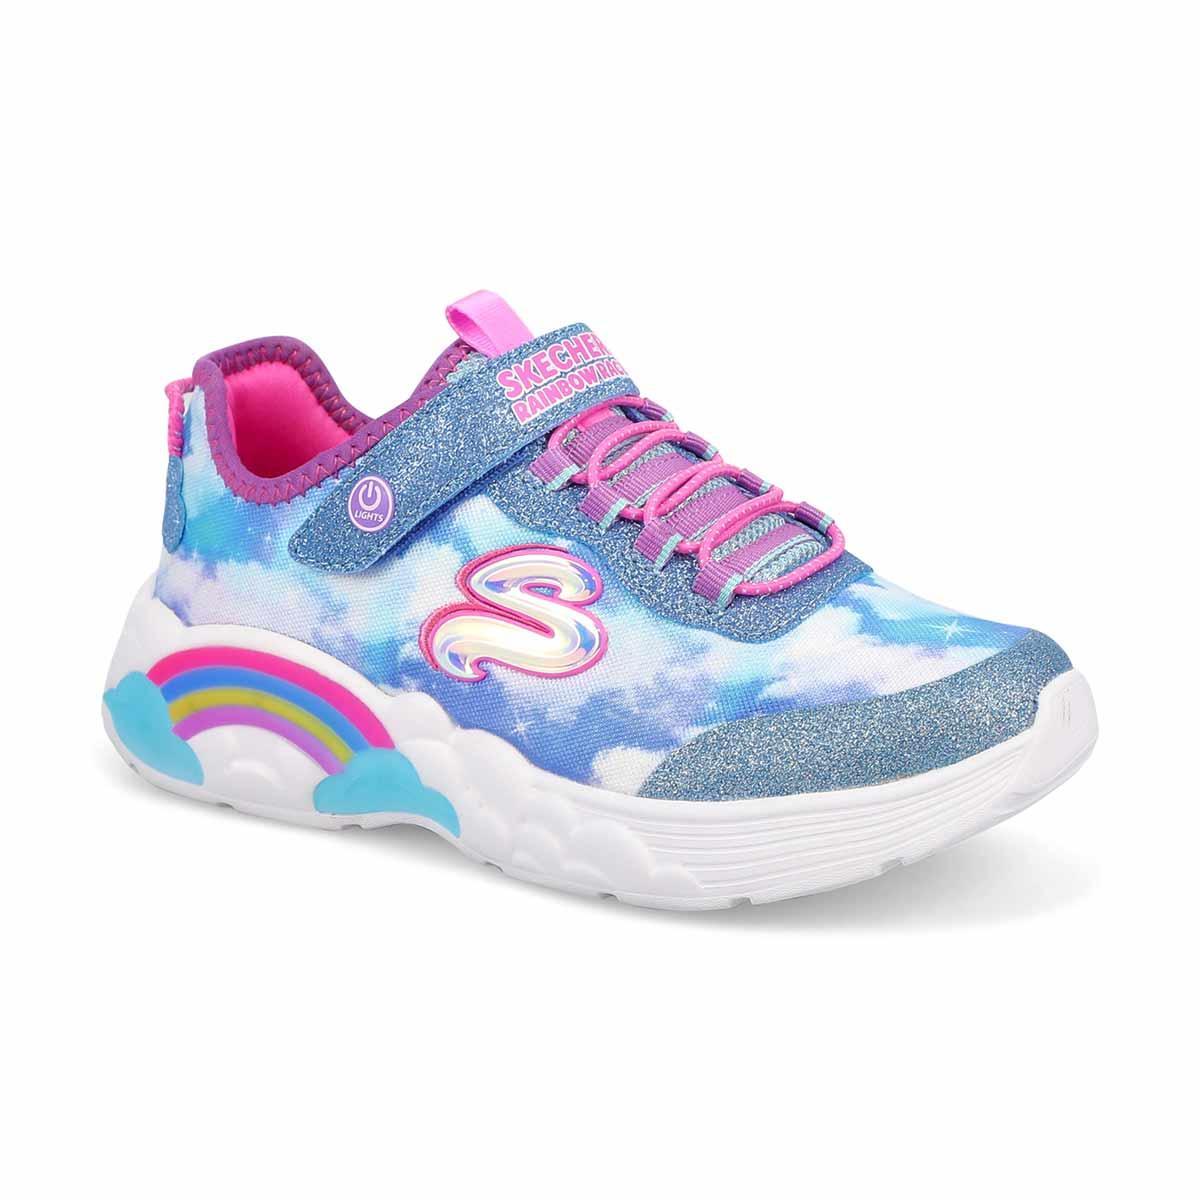 Girls' Rainbow Racer Light Up Sneaker - Blue